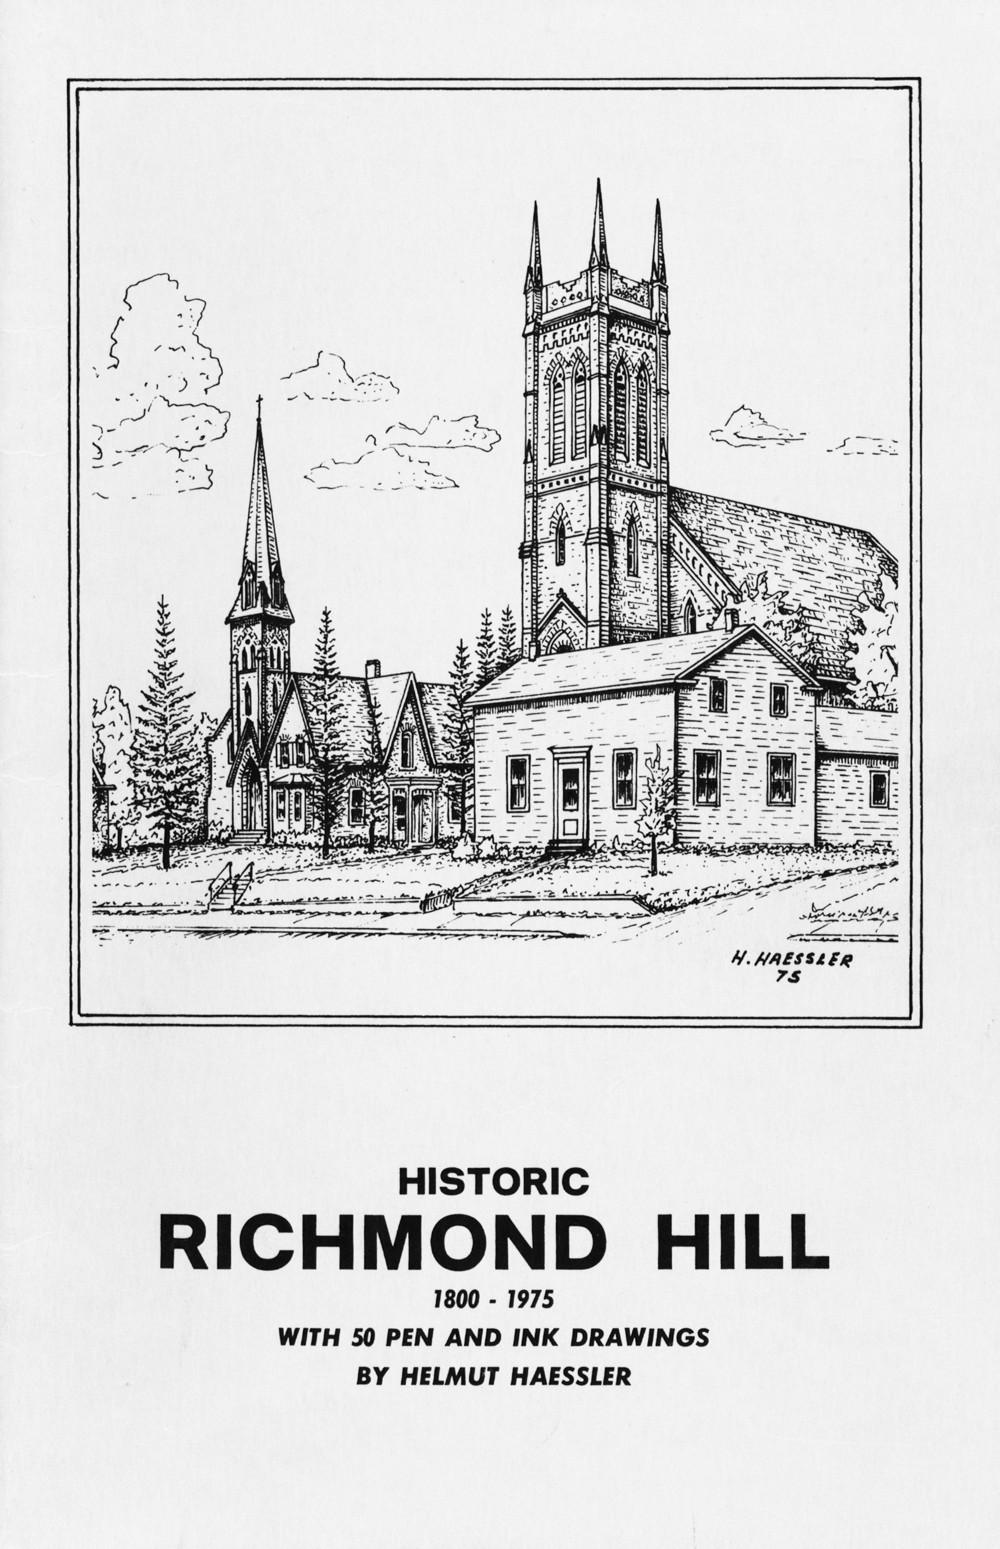 Historic Richmond Hill: 1800-1975